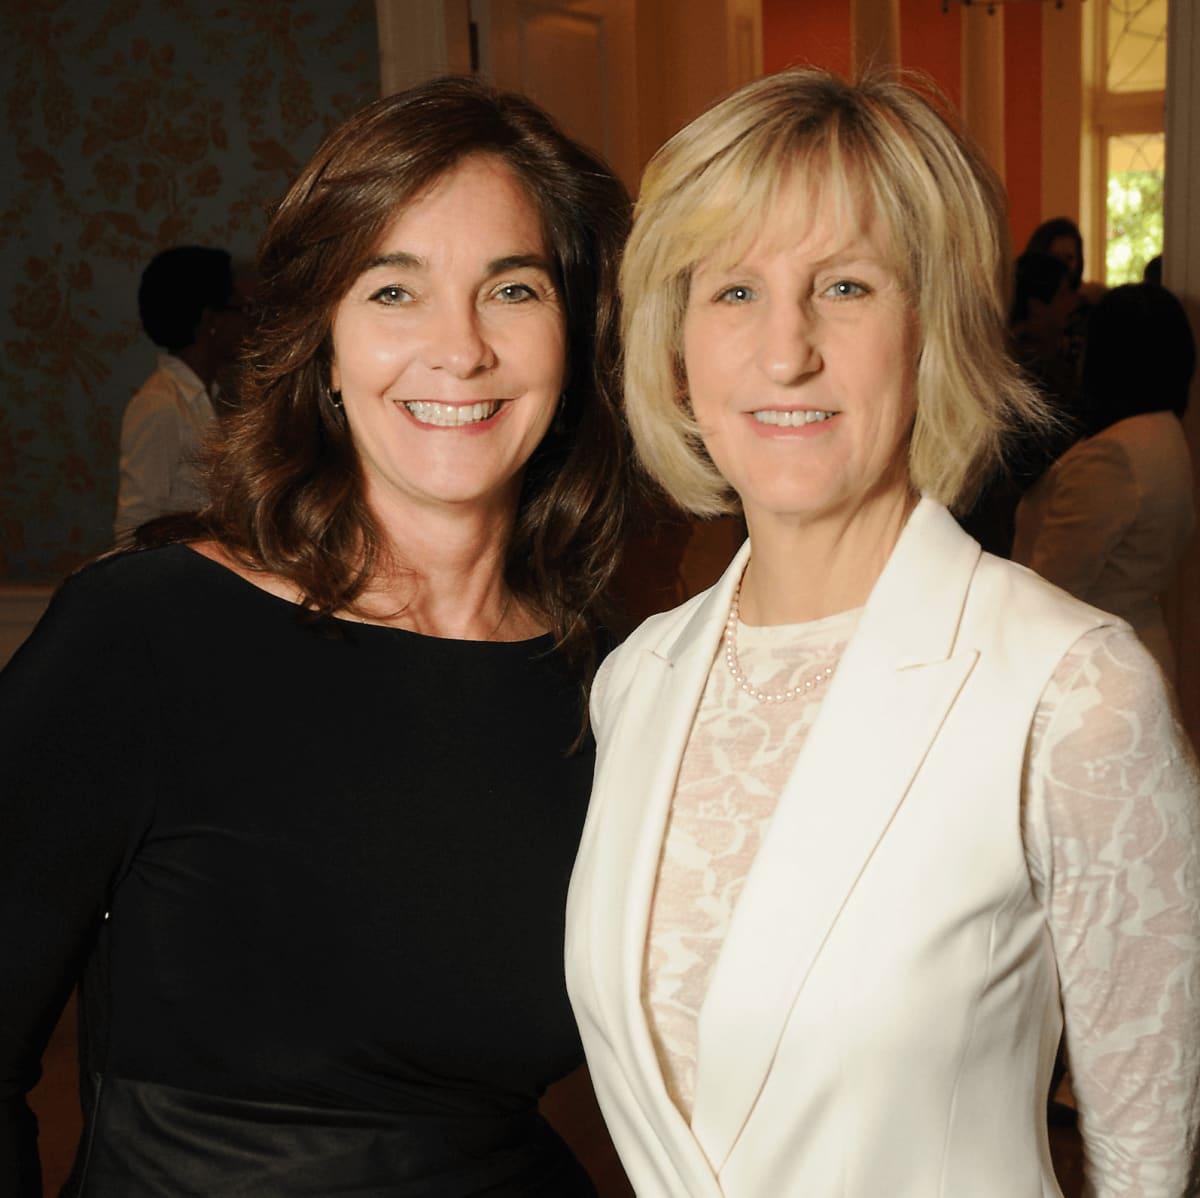 At the Heart of Families, 9/16  Kathleen Diamonon, Sarah Terrell